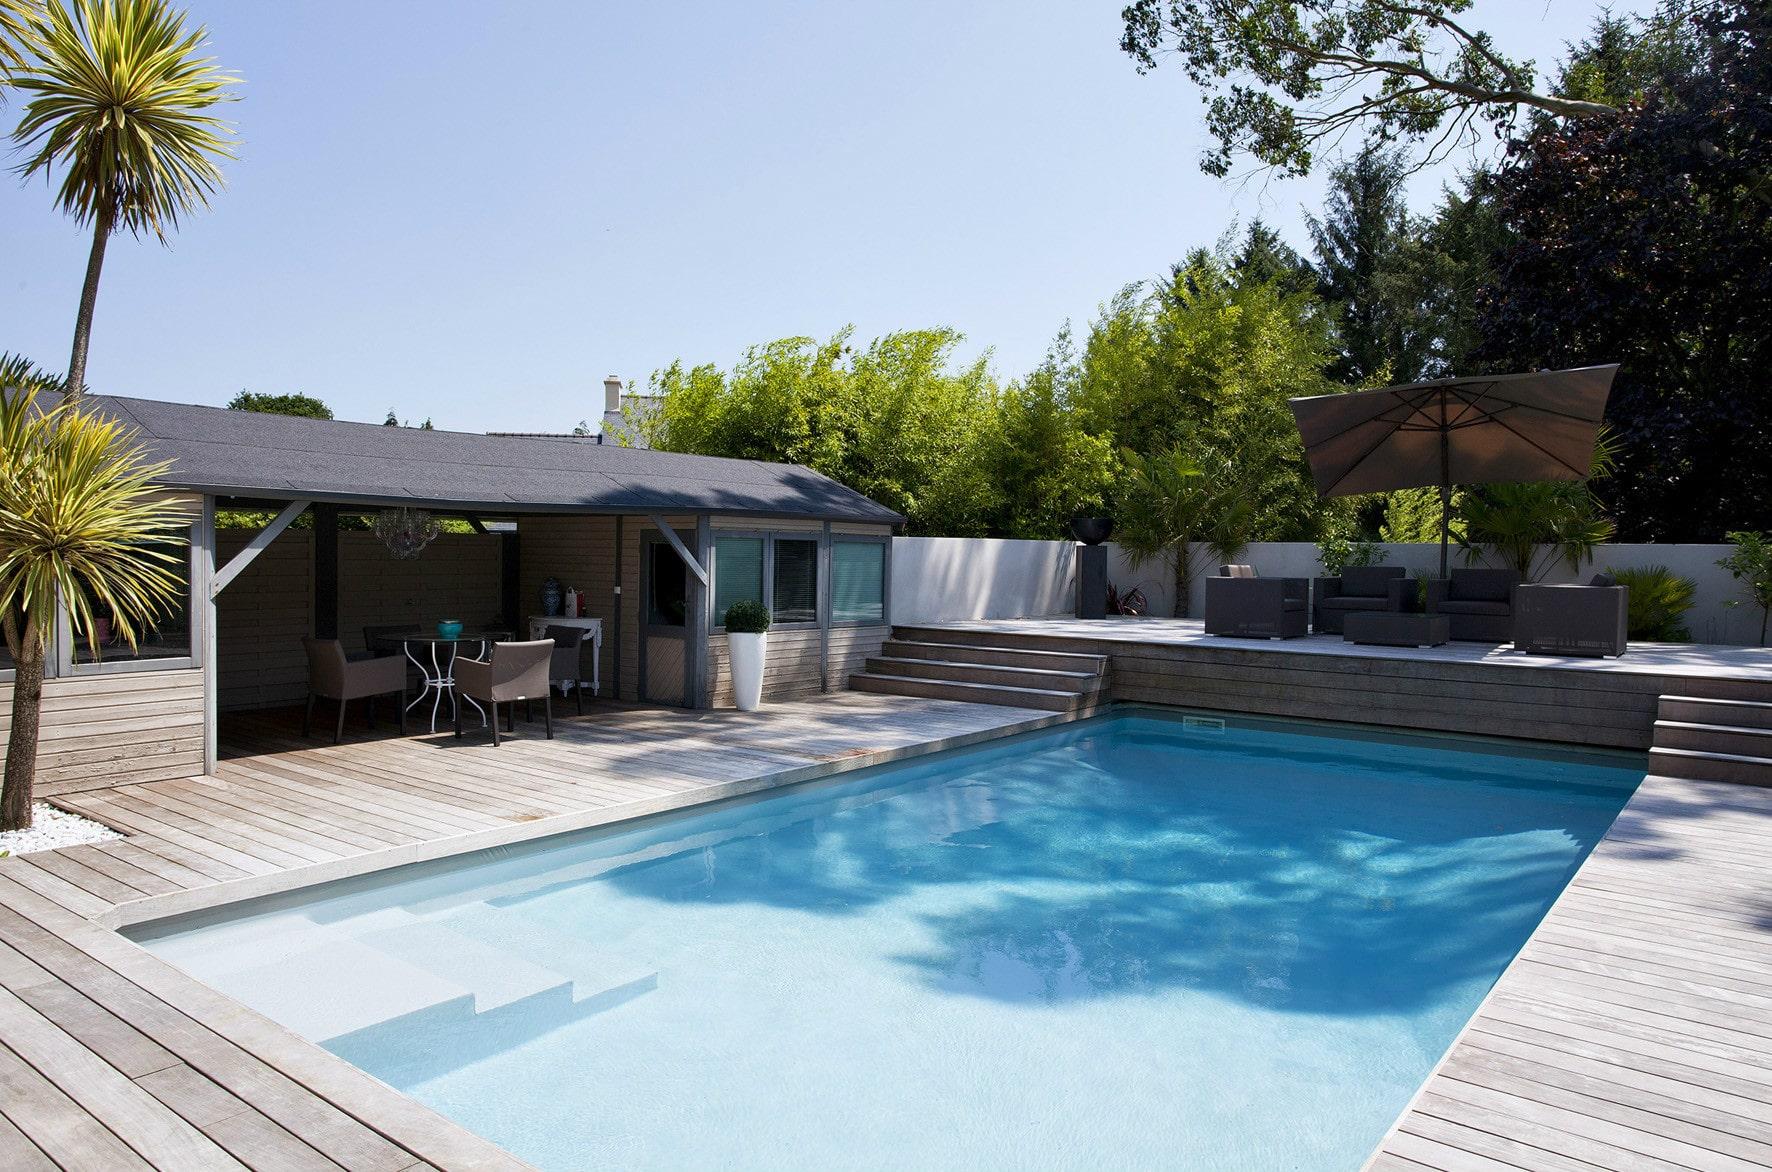 troph es de la piscine et du spa 2015 id es piscine